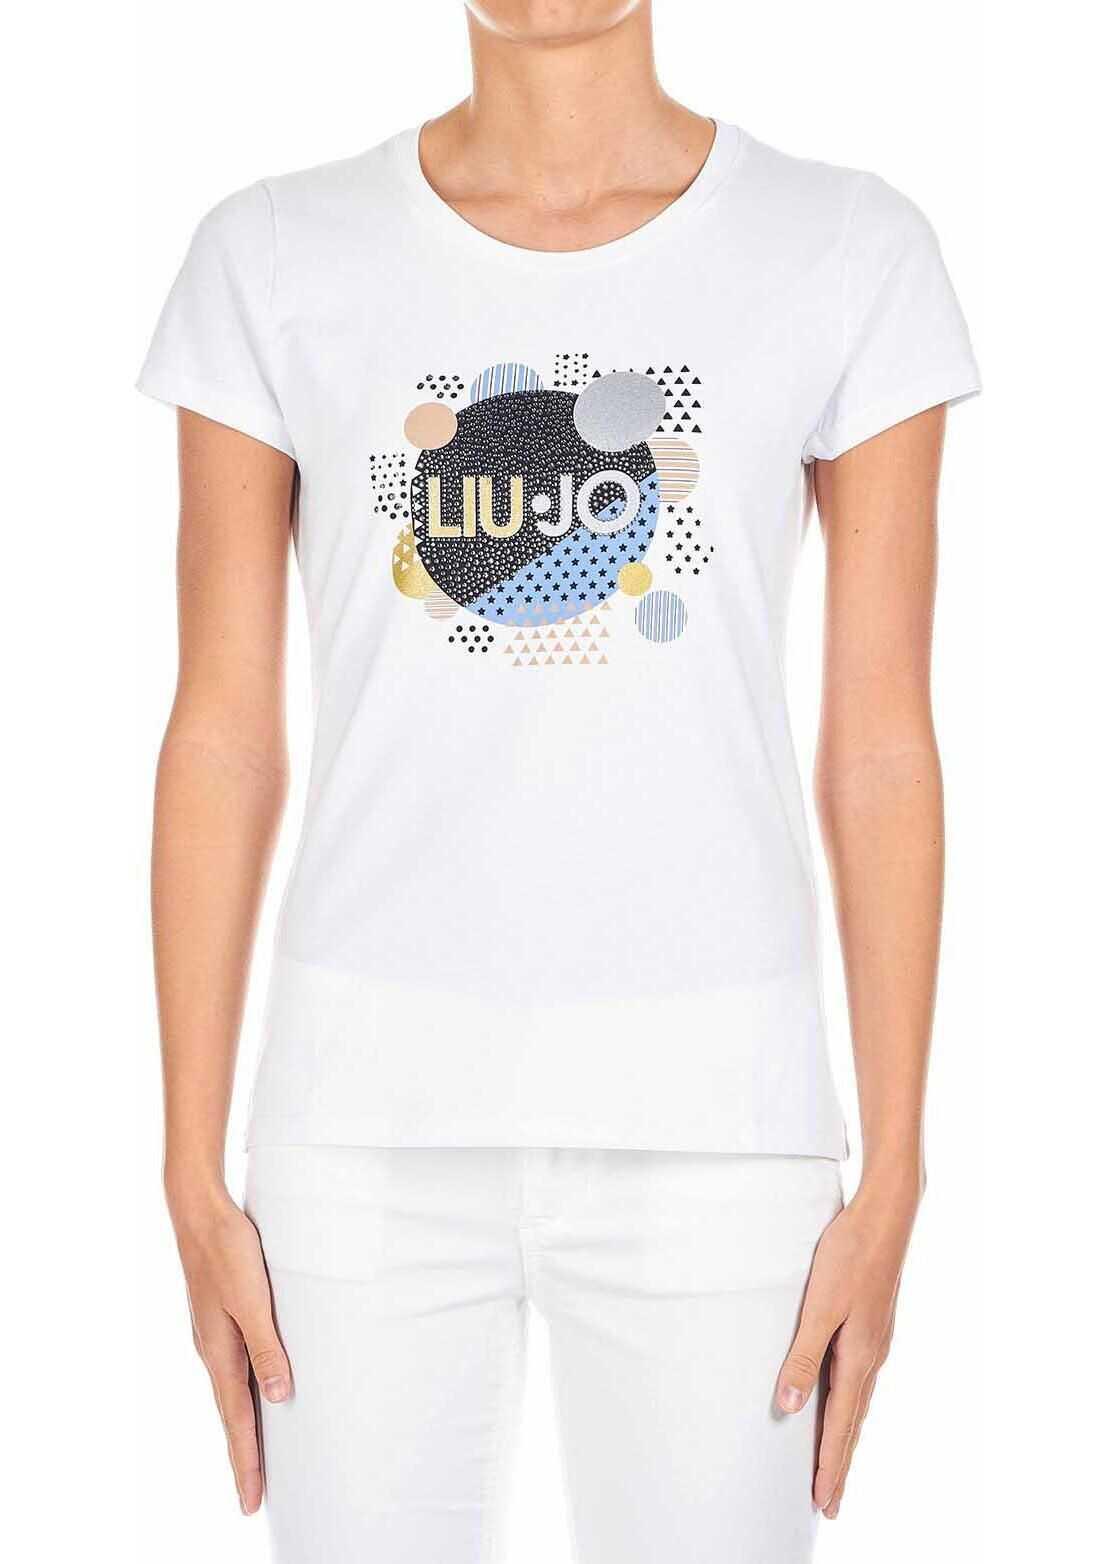 Liu Jo T-Shirt with logo-print White